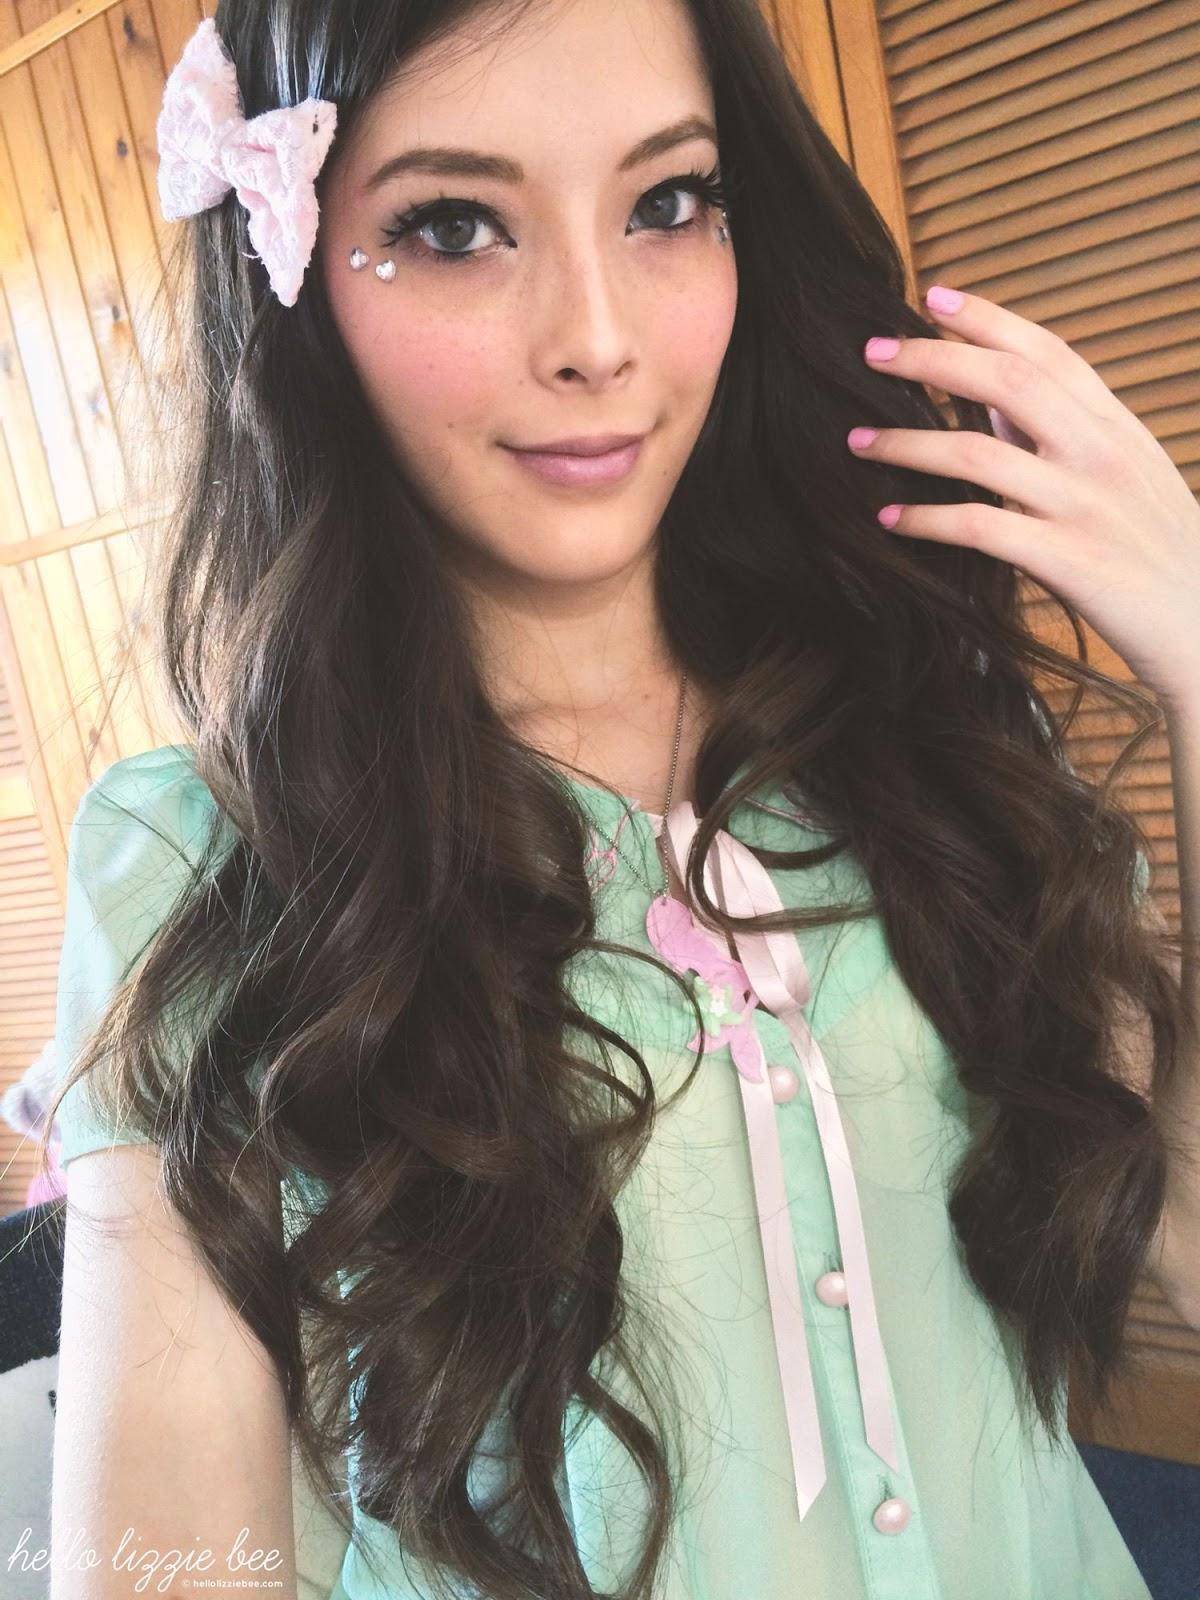 mahou kei, mermaid, kawaii fashion